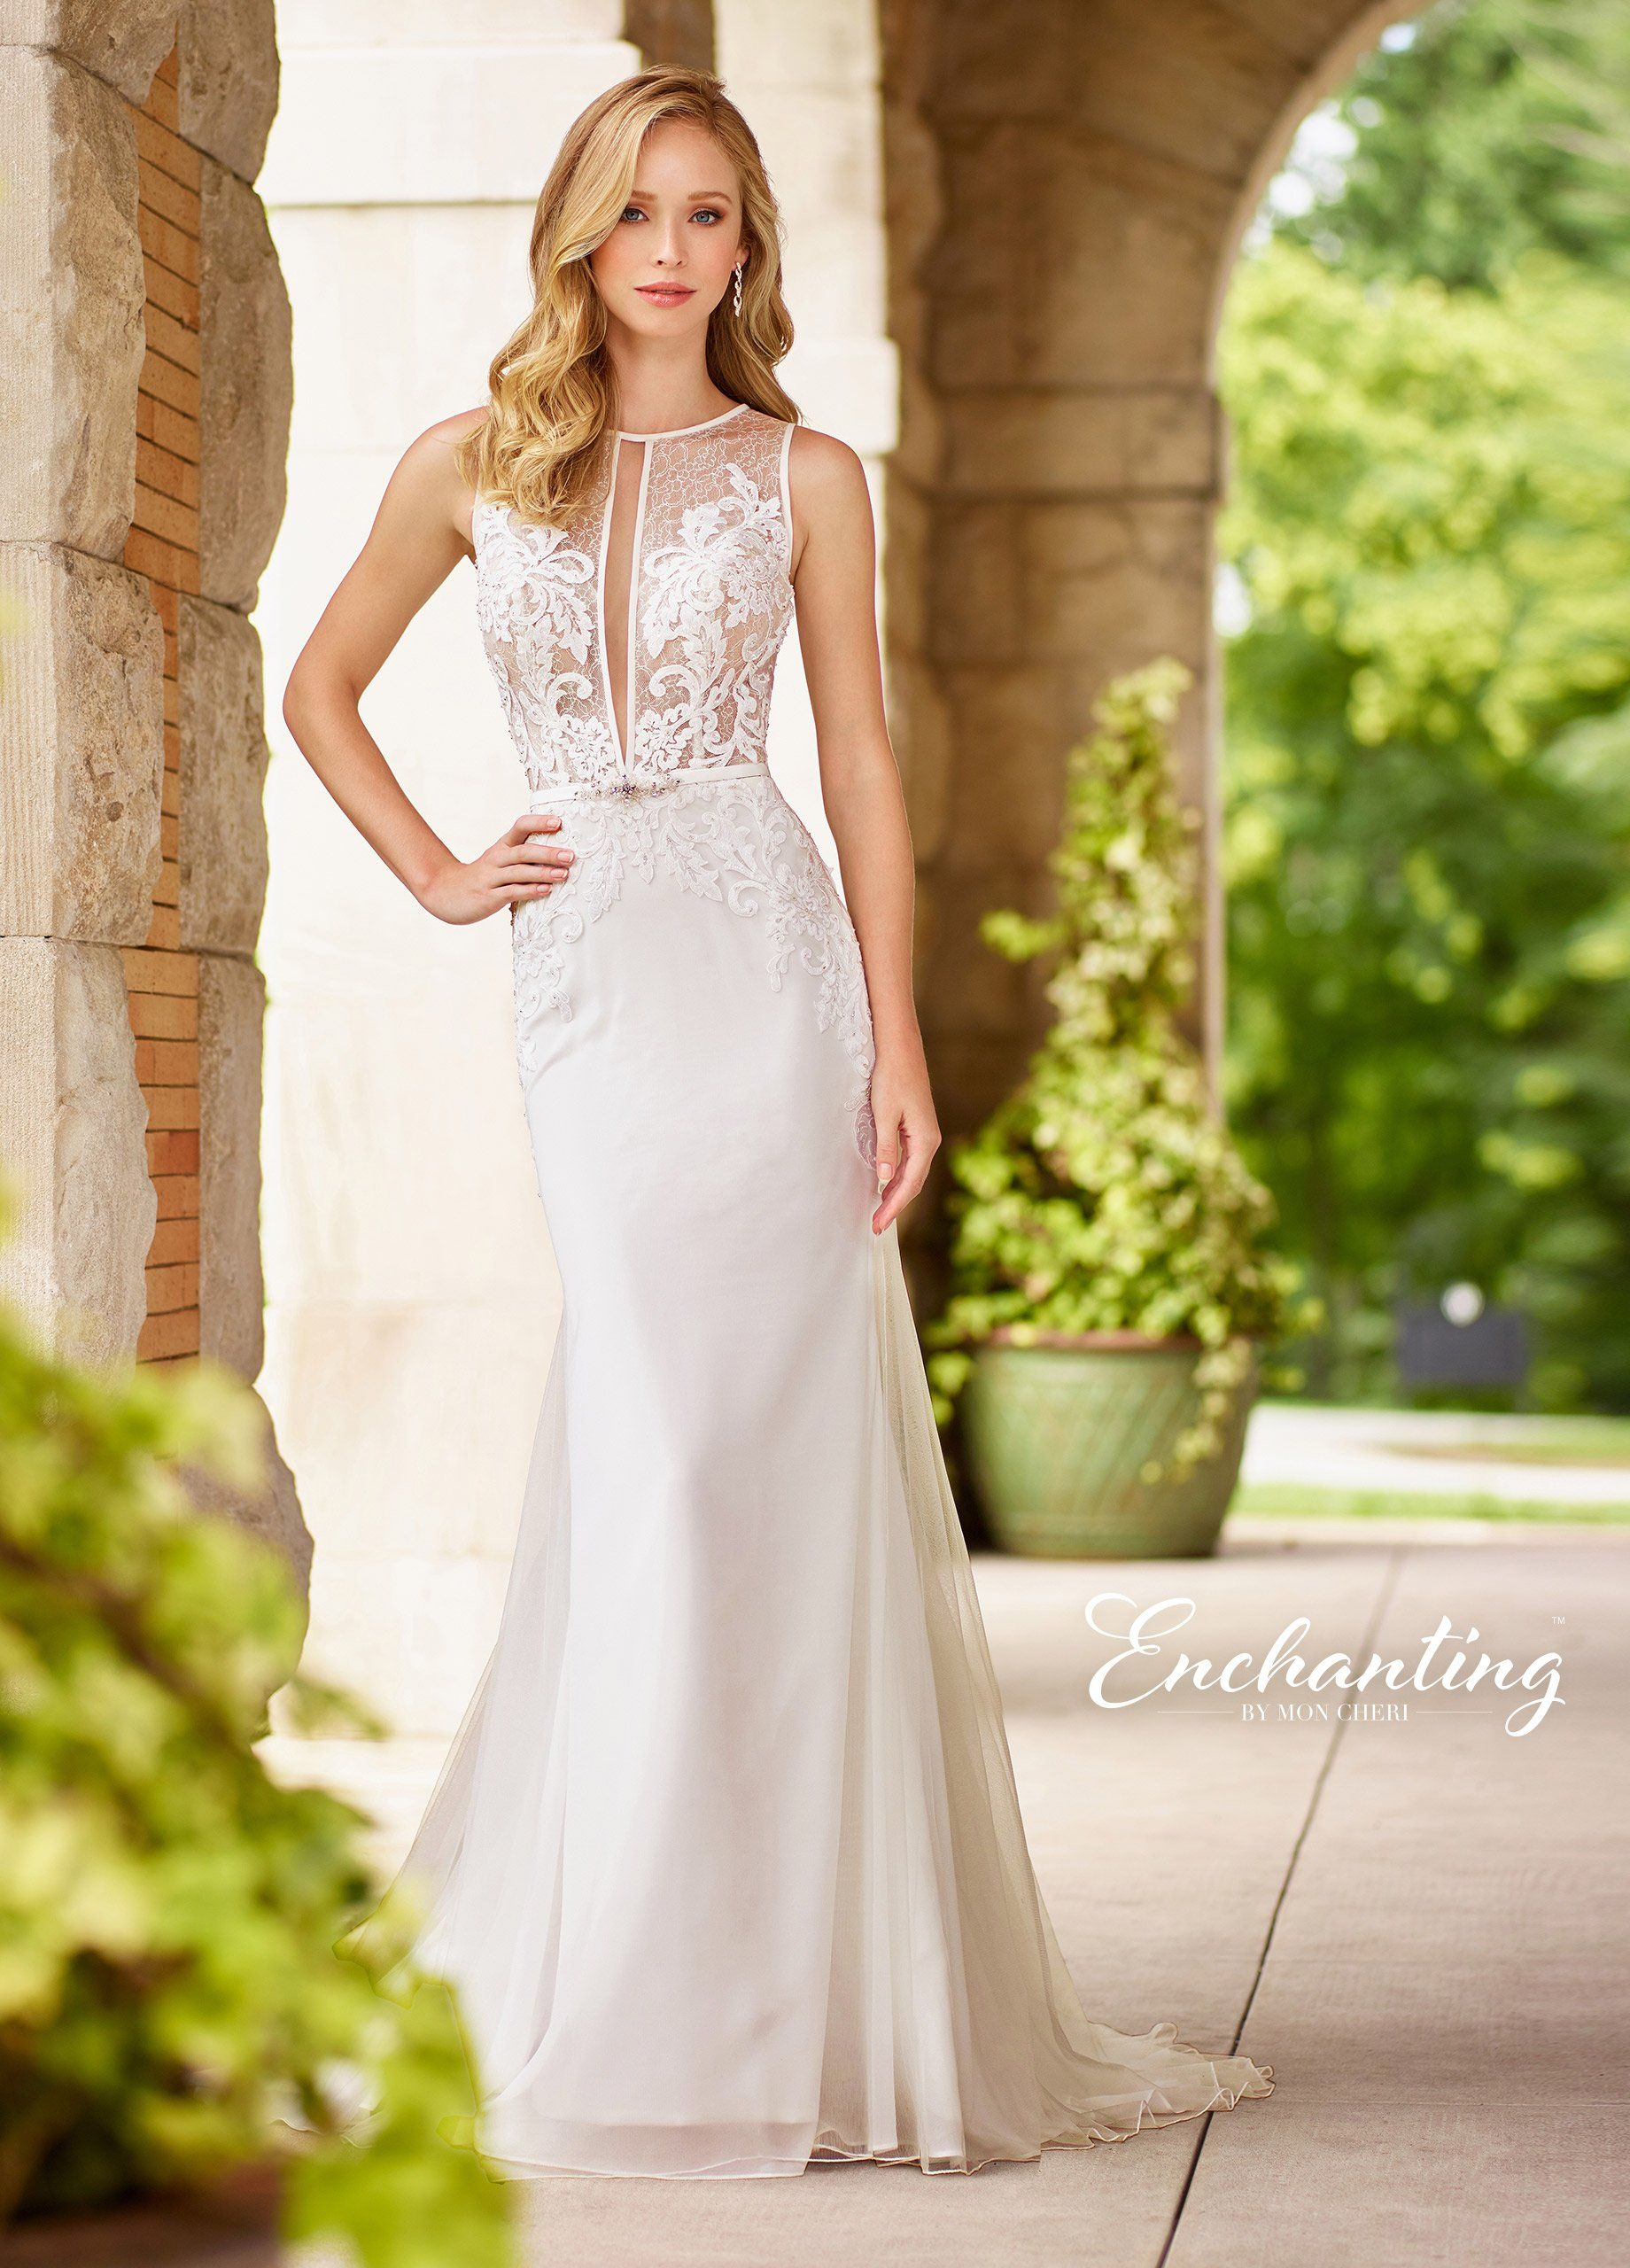 Enchanting by mon cheri wedding dresses pinterest